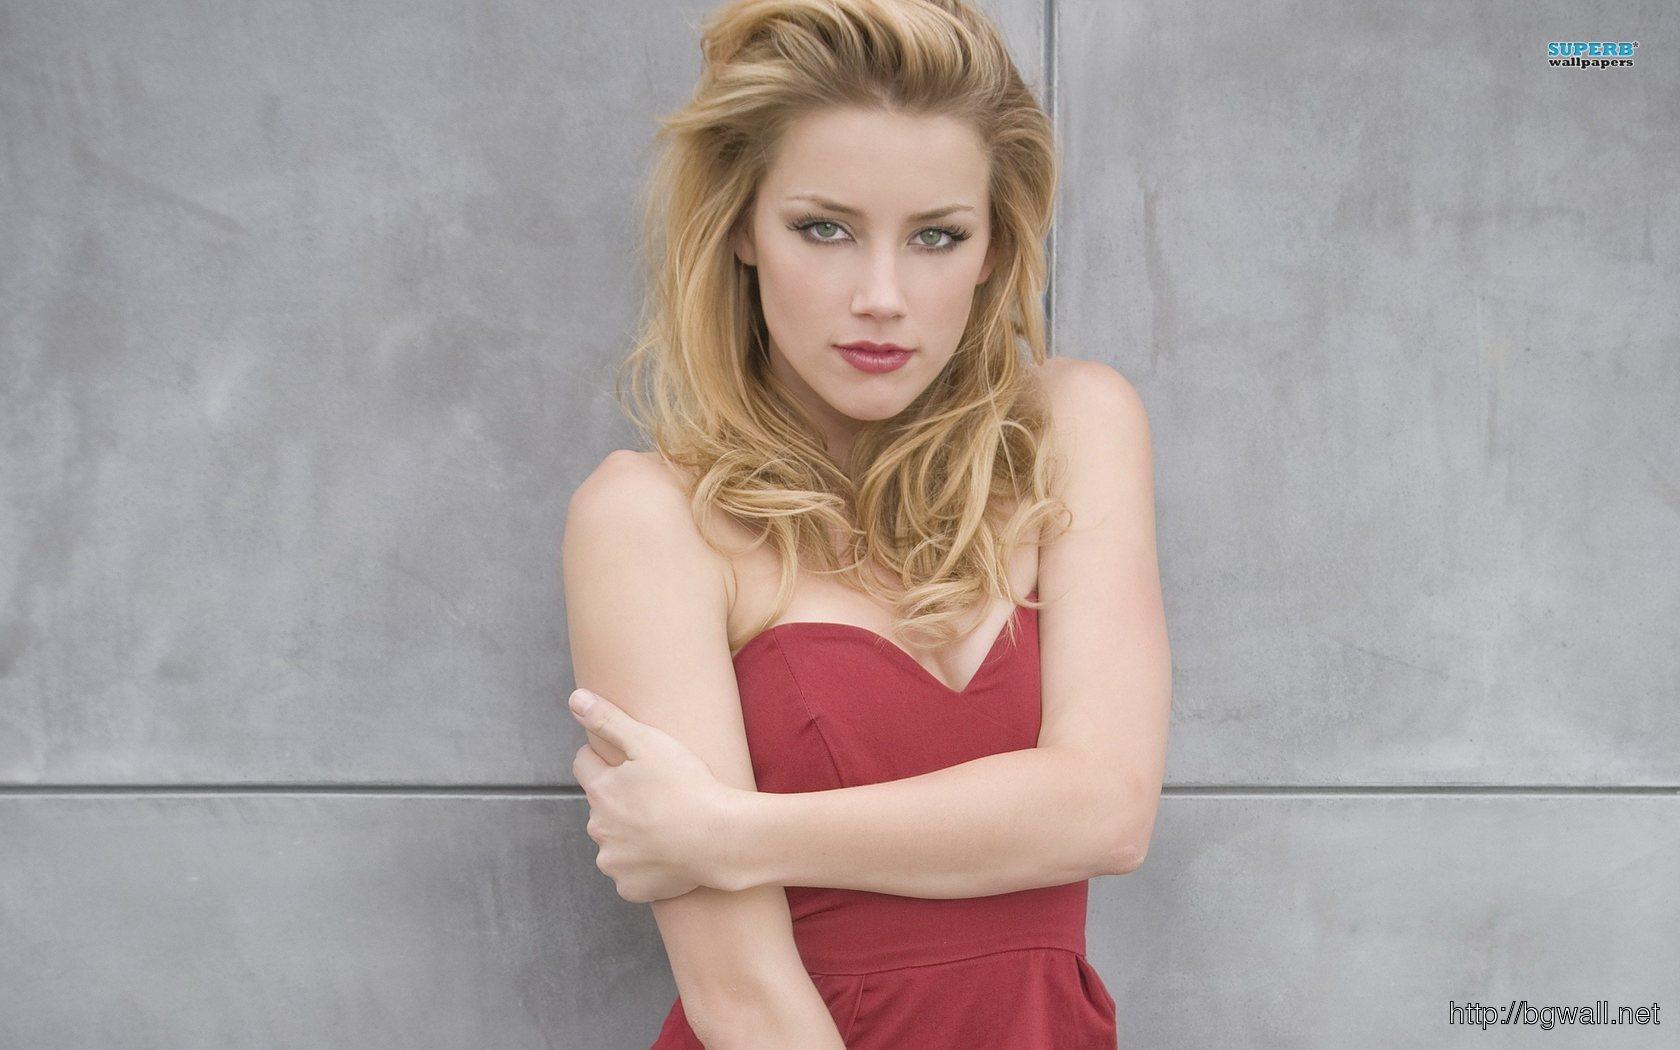 Amber Heard Wallpaper Full Size